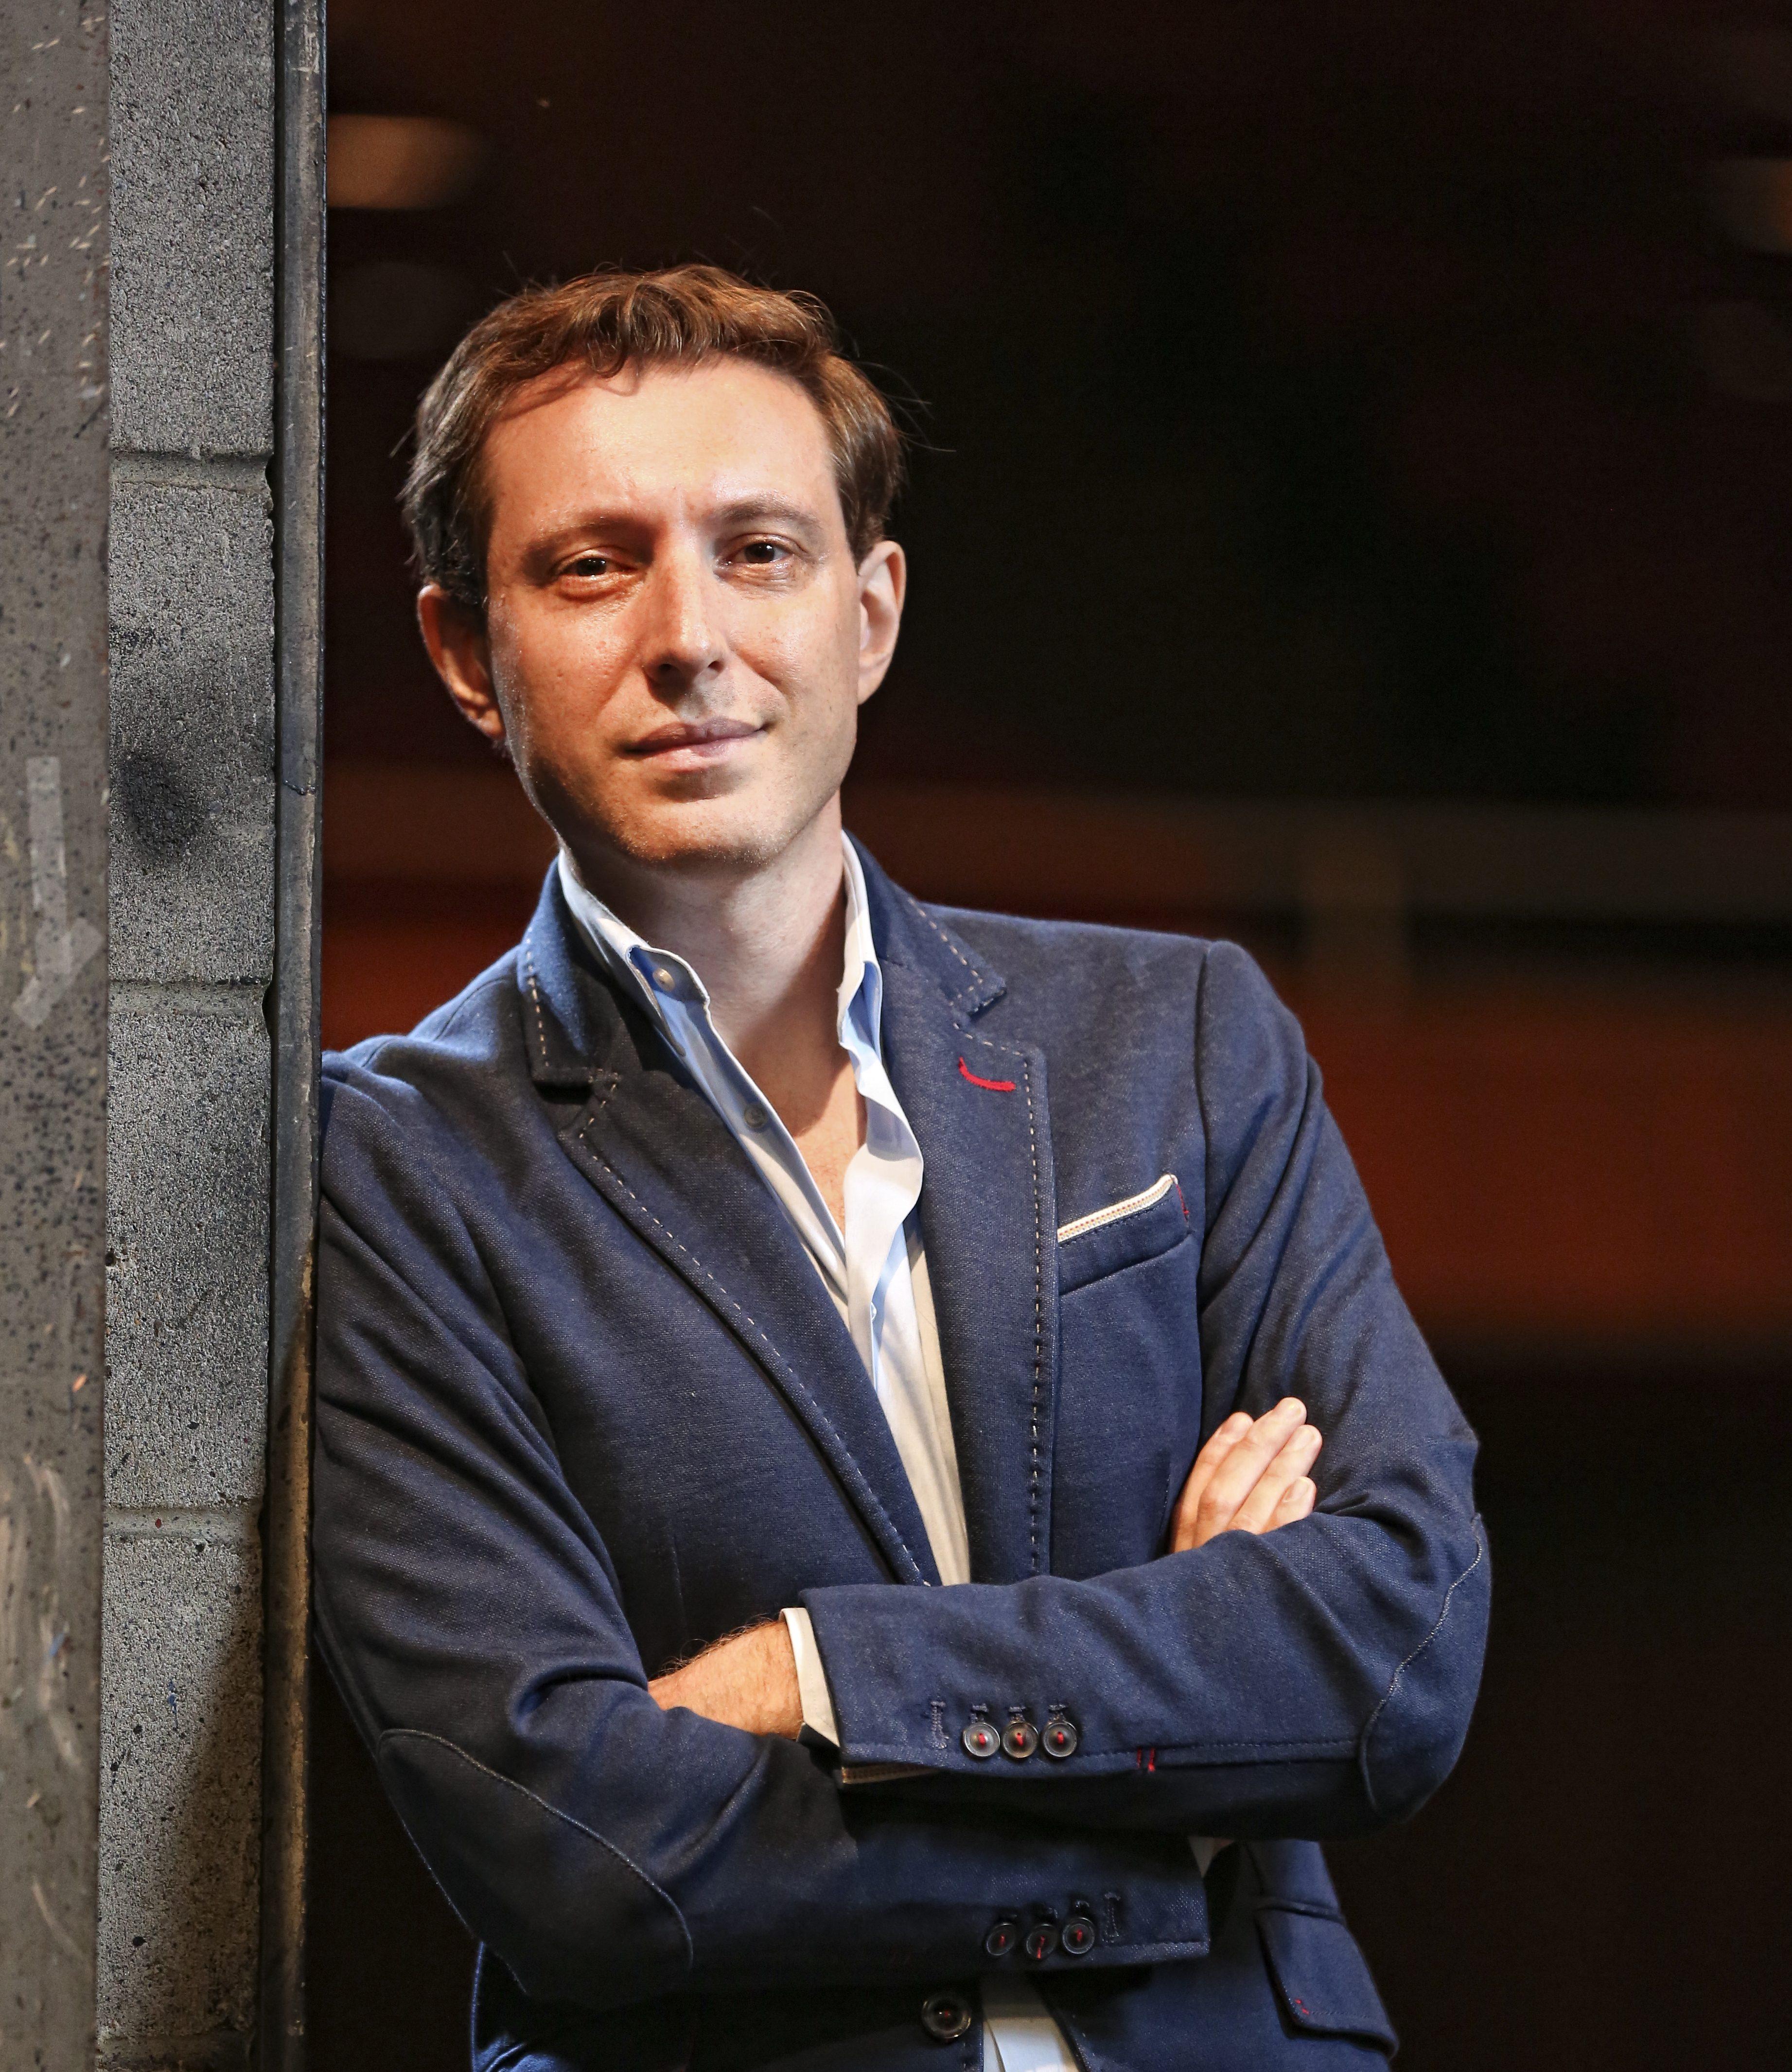 Yevgeny Ivanov - theater and film actor 42